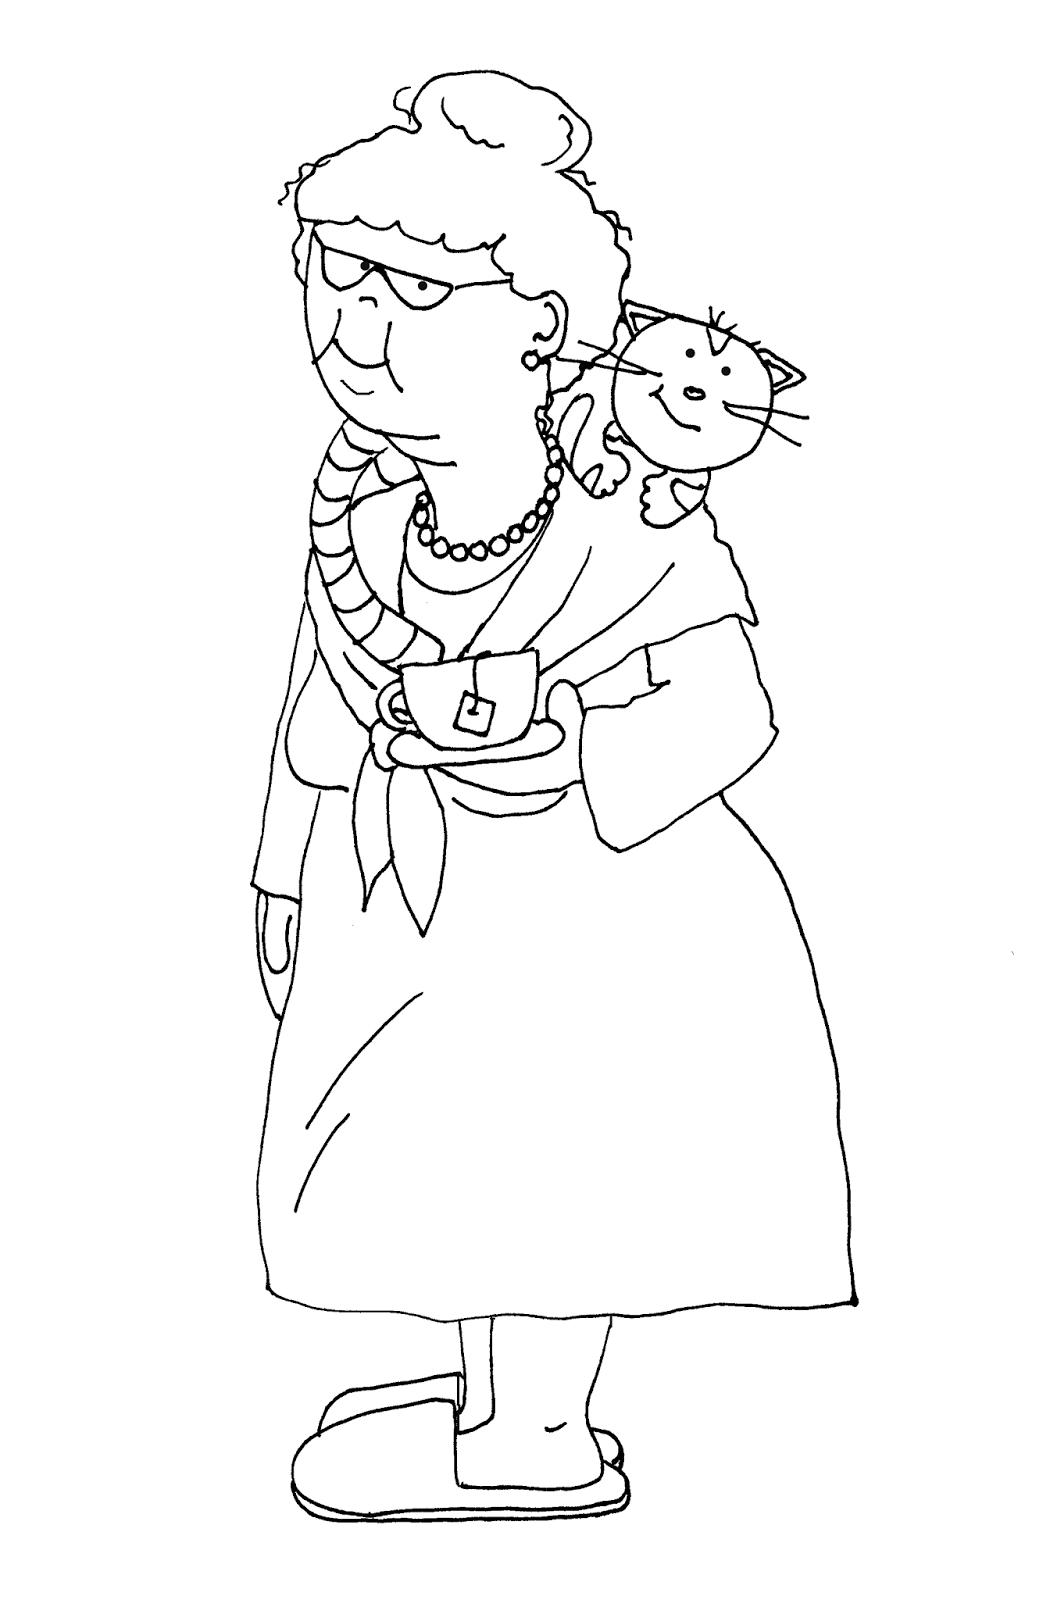 Раскраска бабушке